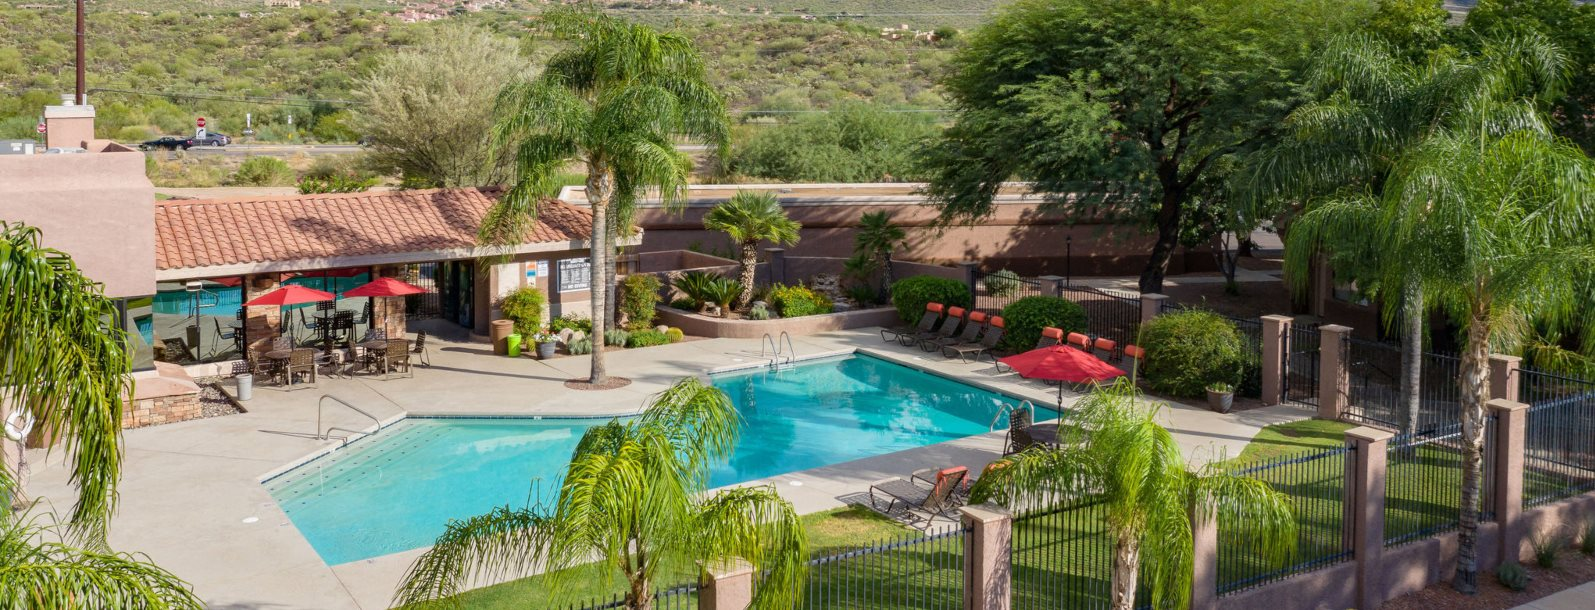 Pool & pool patio at Rock Ridge in Oro Valley, AZ